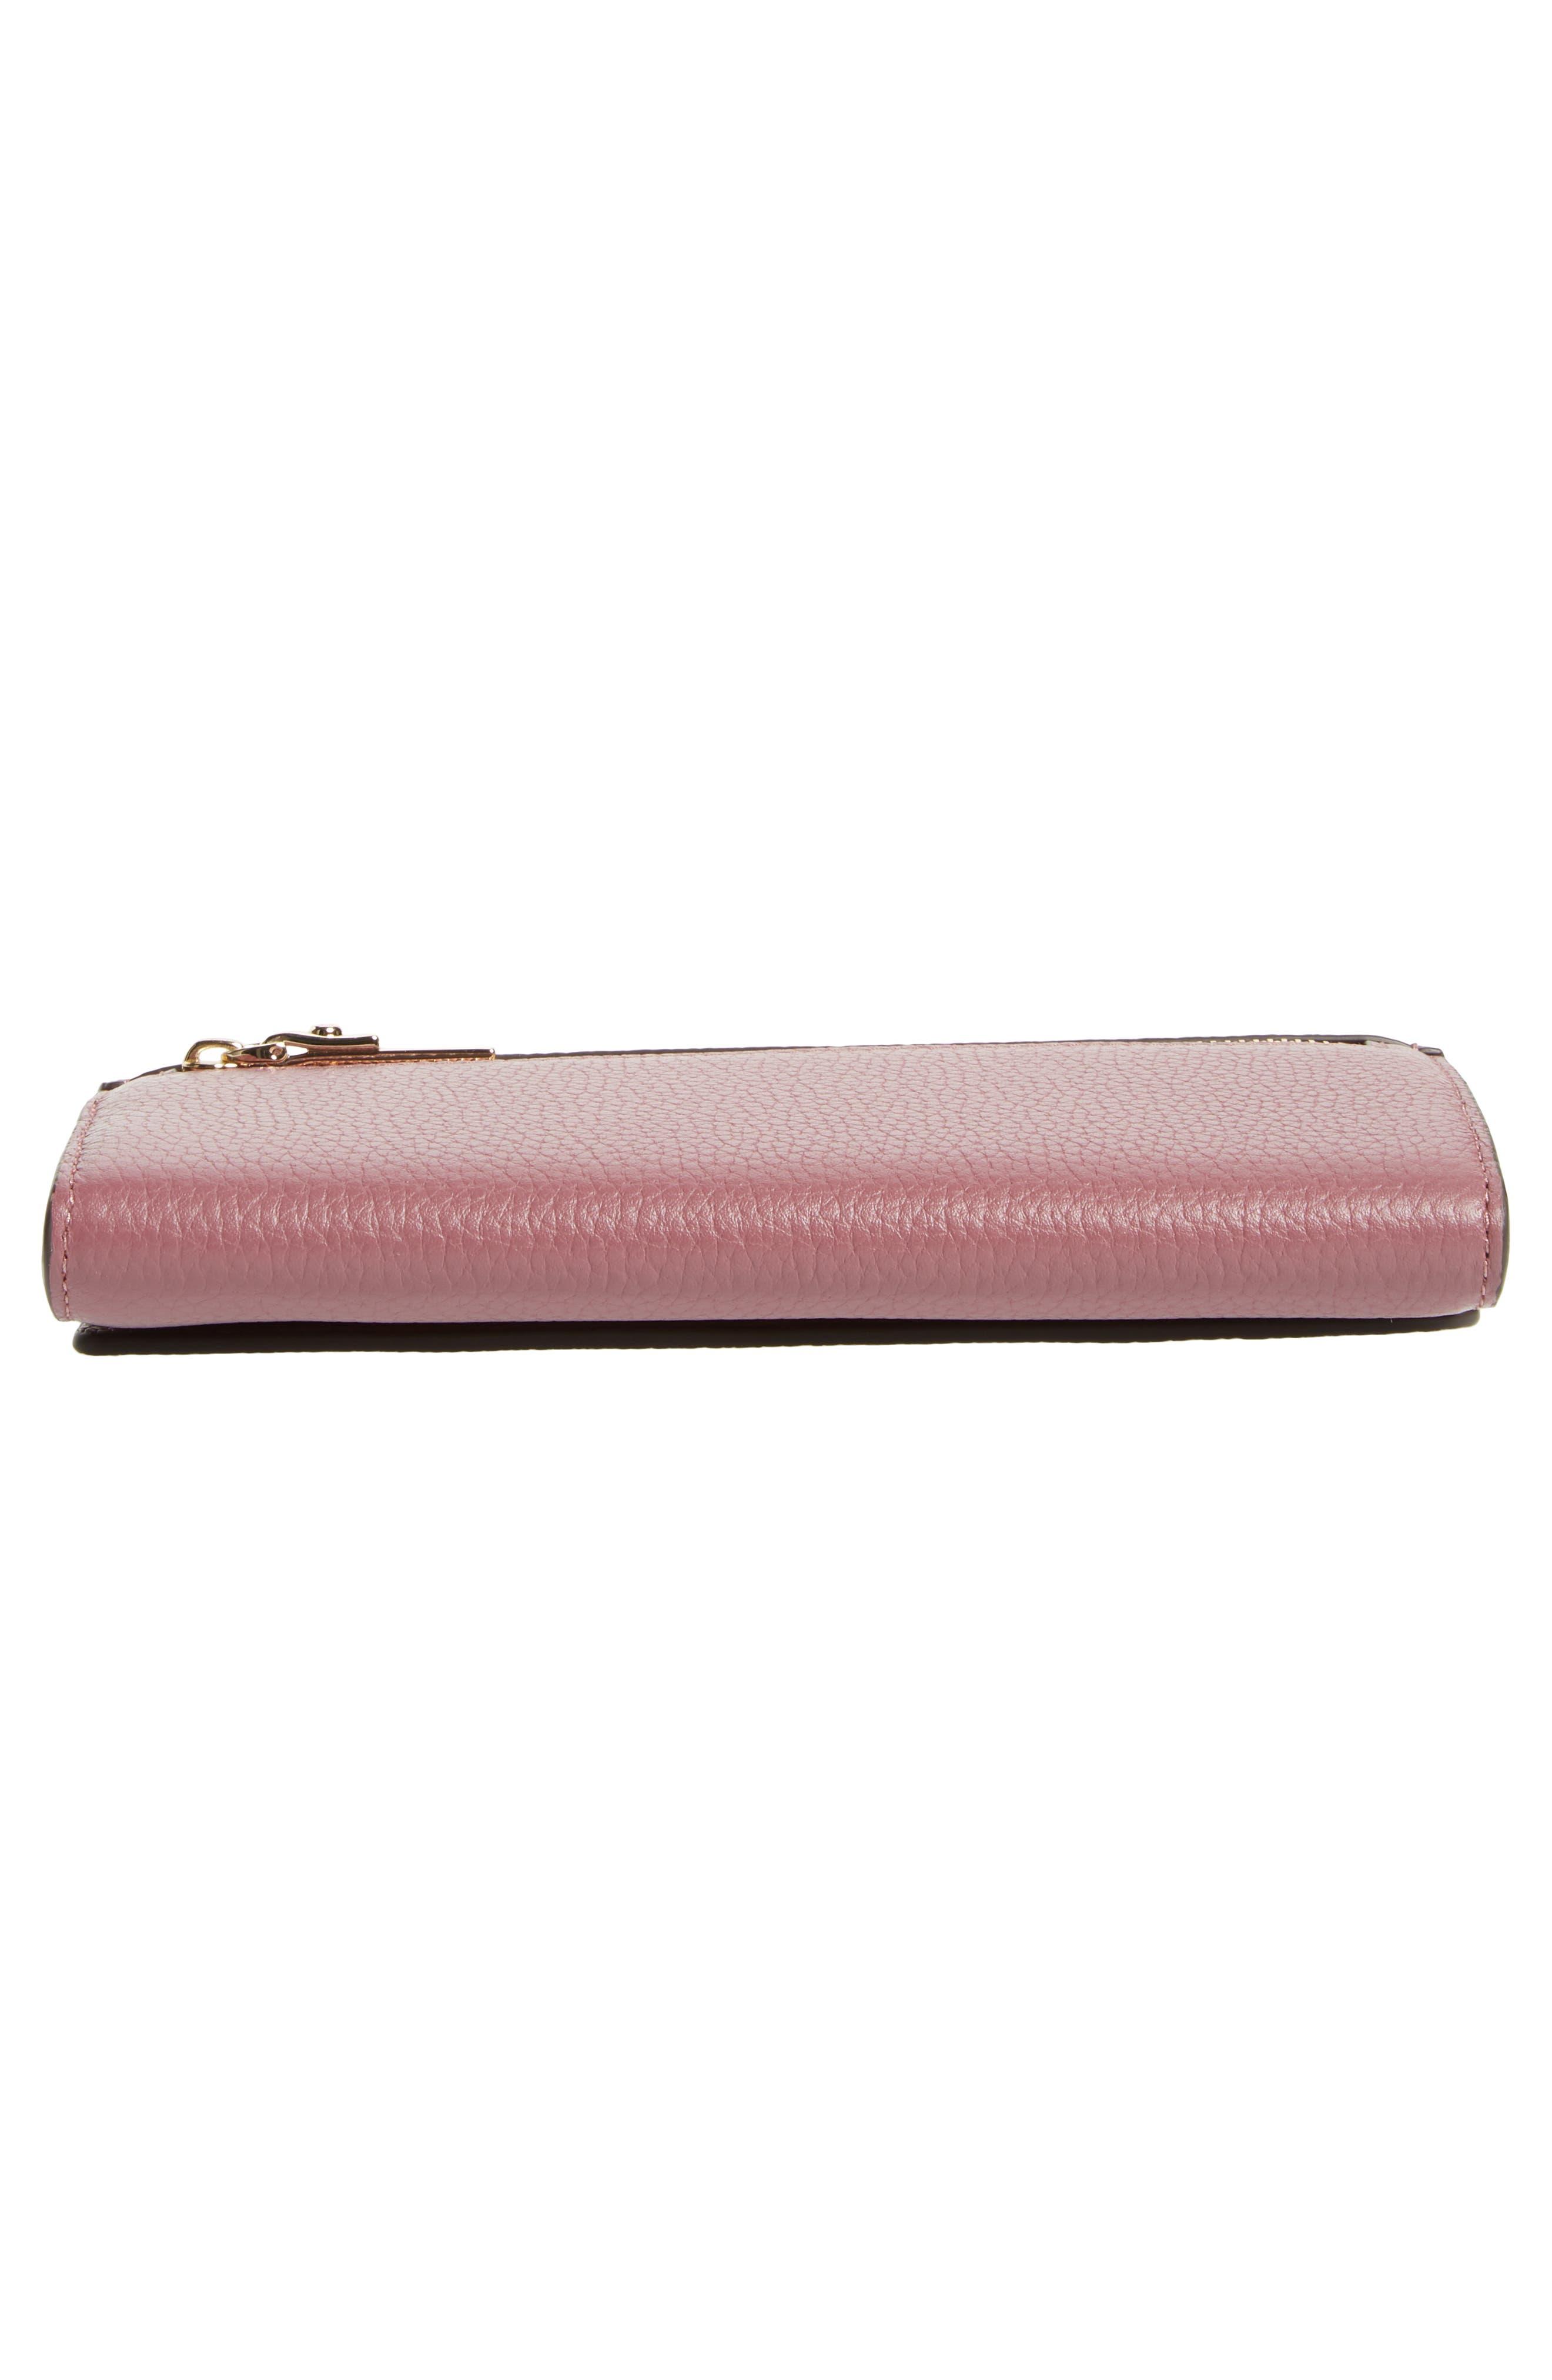 oakwood street – kinsley pebbled leather wallet,                             Alternate thumbnail 6, color,                             564